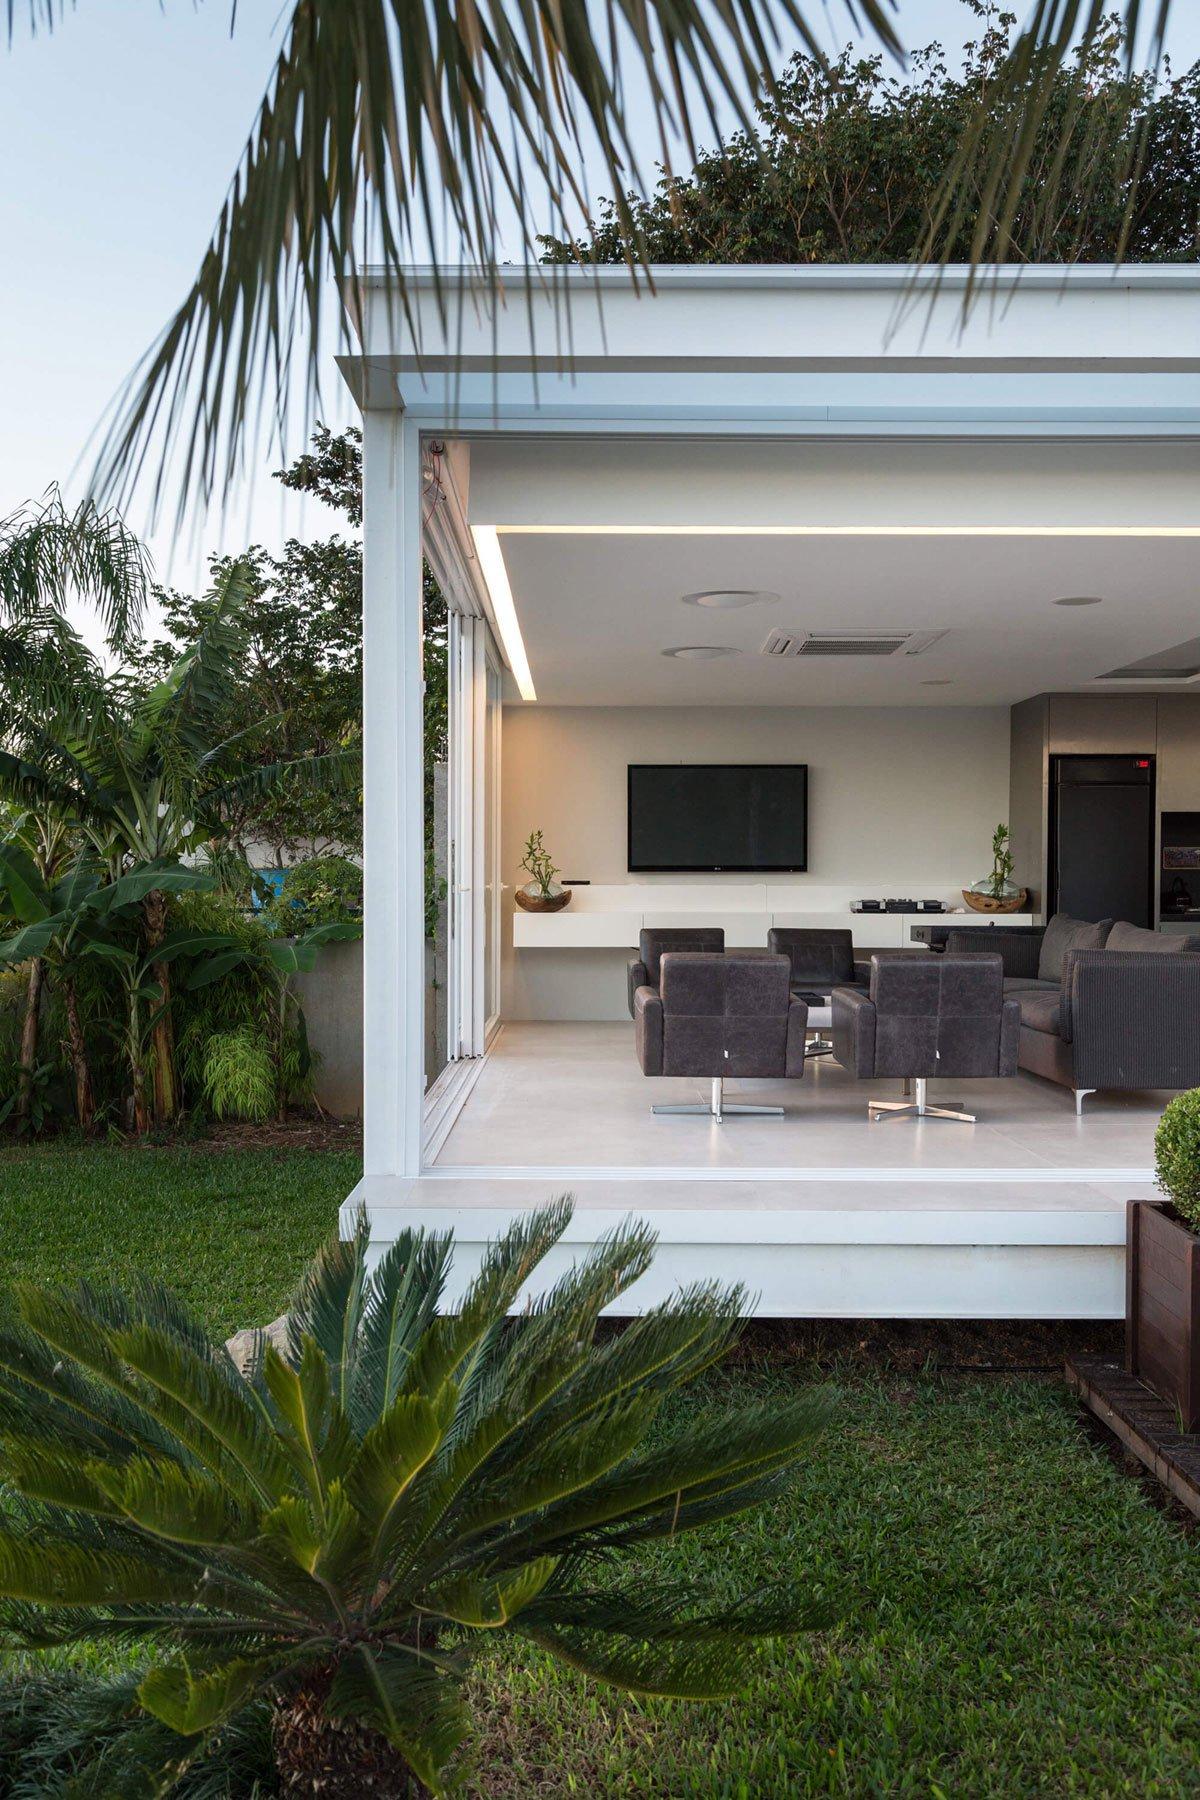 Pool-House-in-Porto-Alegre-04